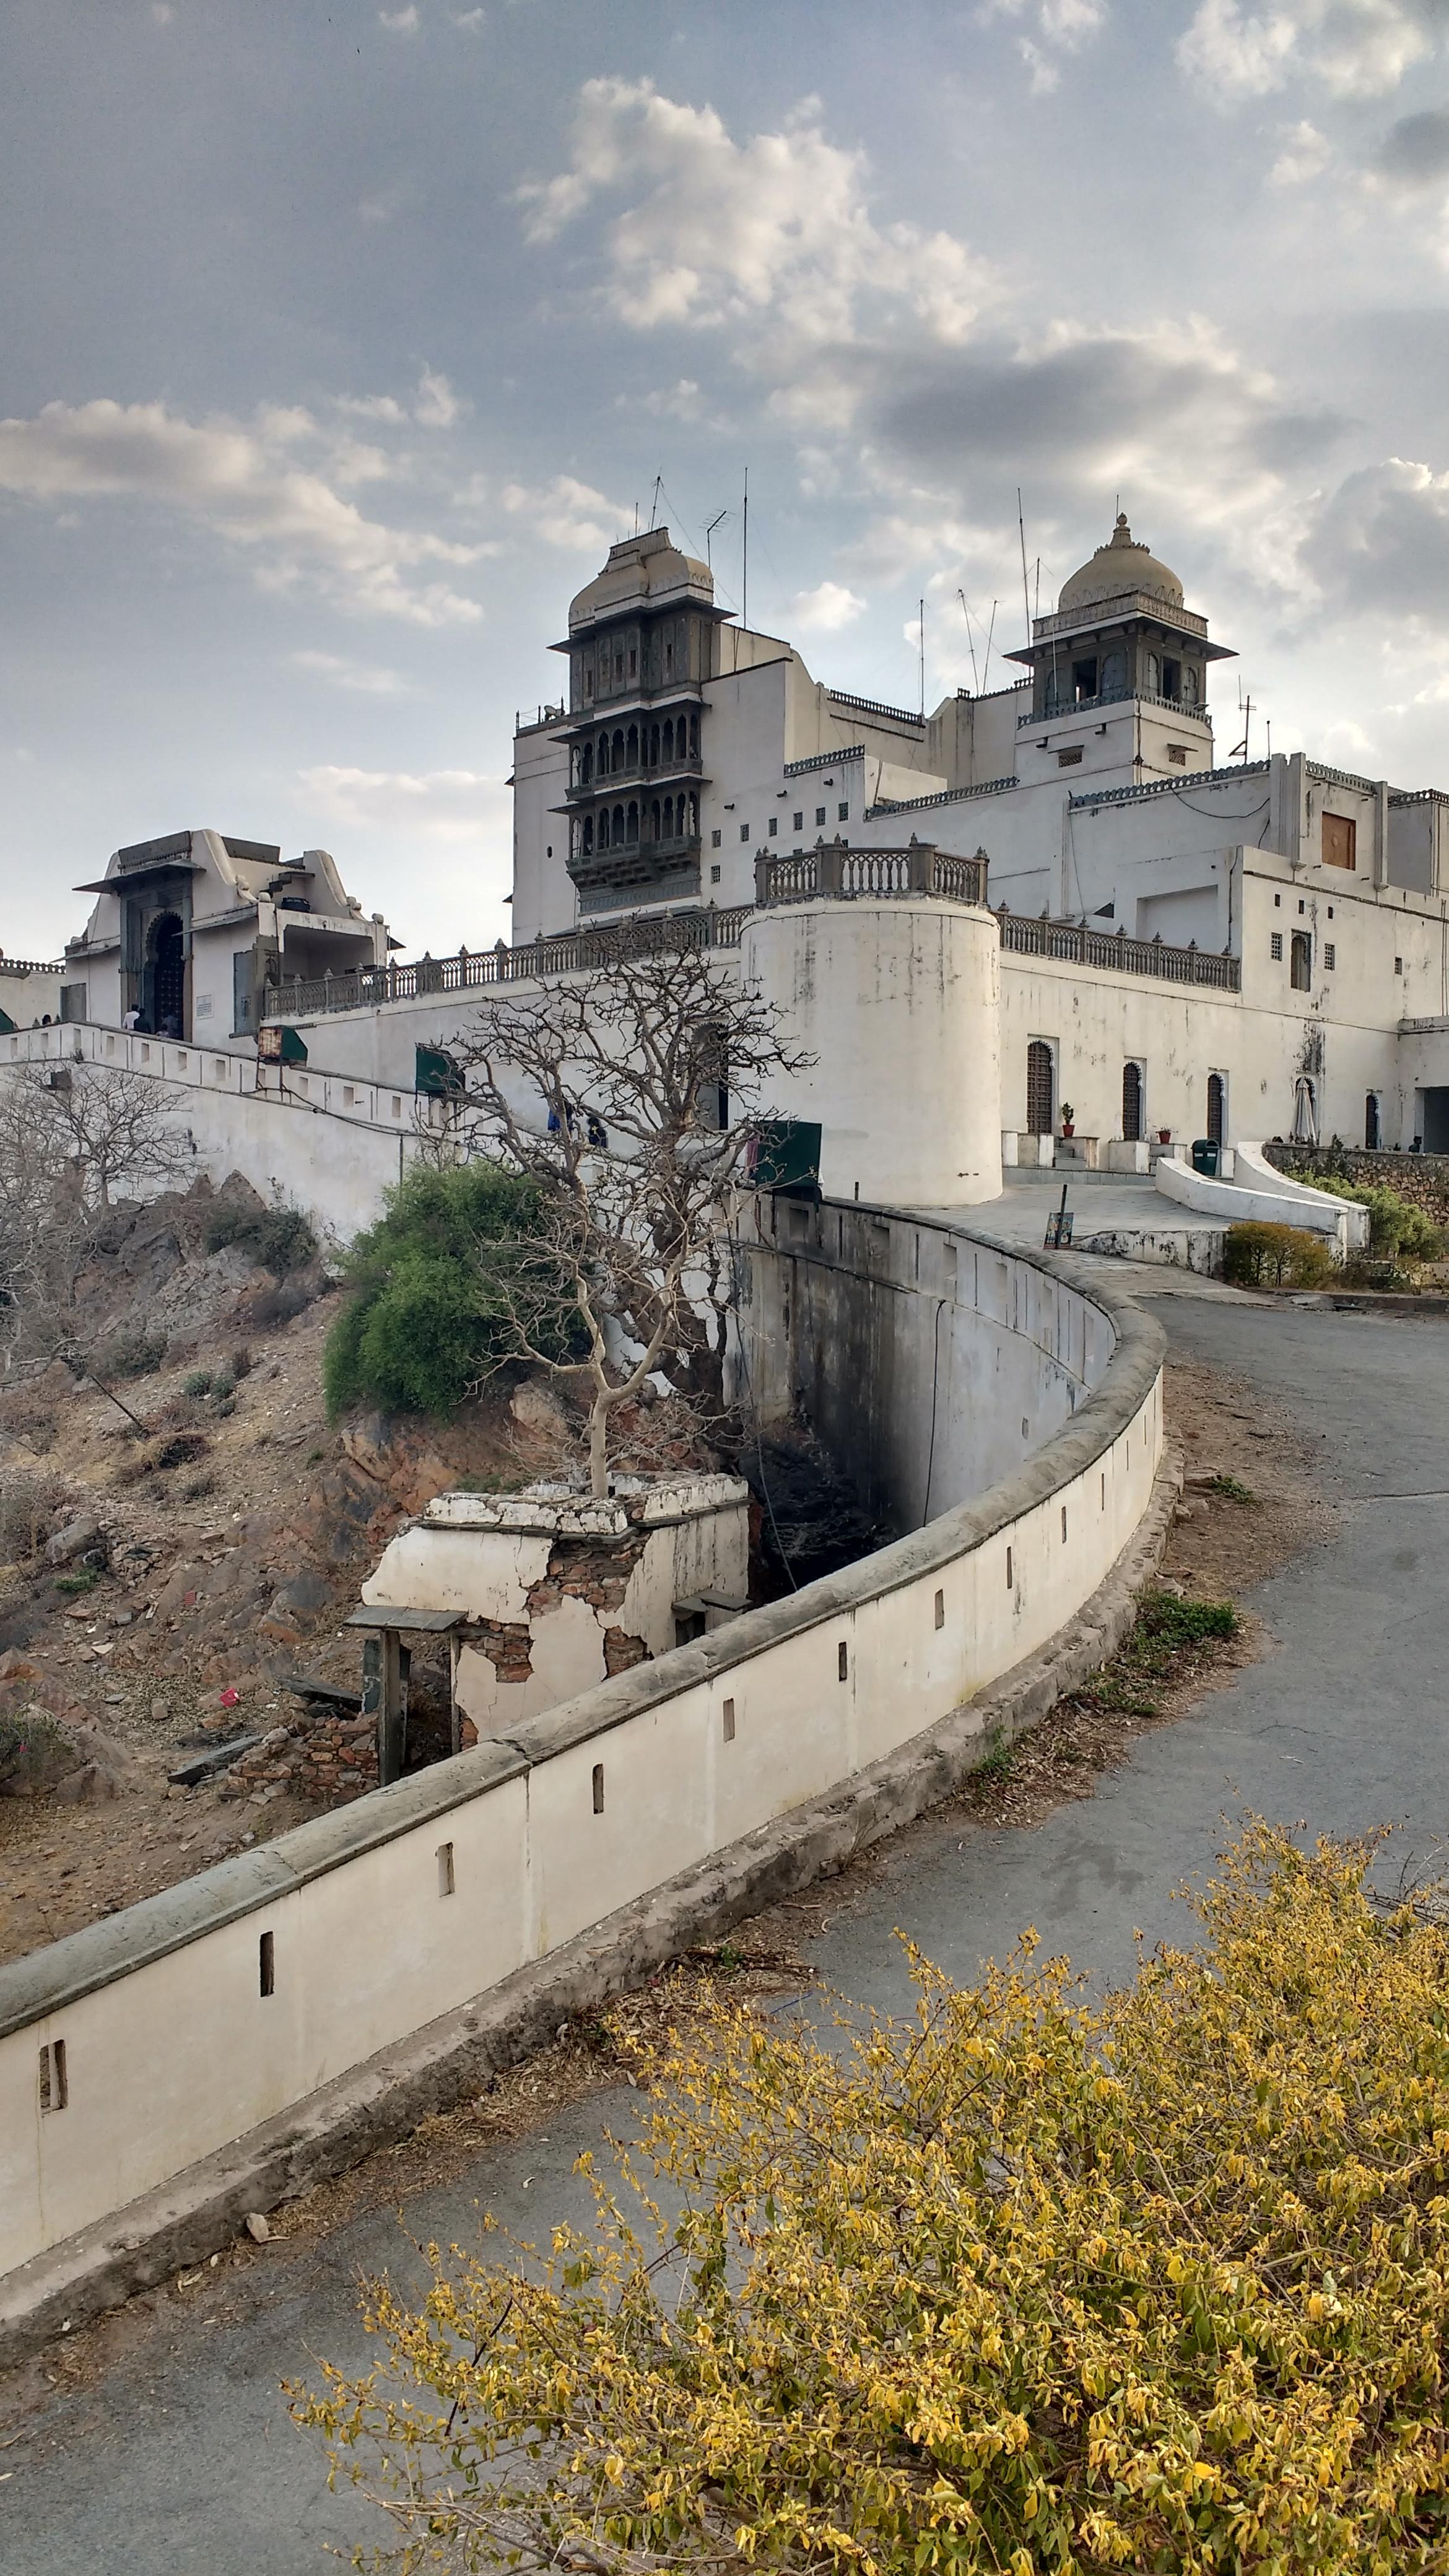 File:Sajjan garh, Udaipur, Rajasthan, India.jpg - Wikimedia Commons